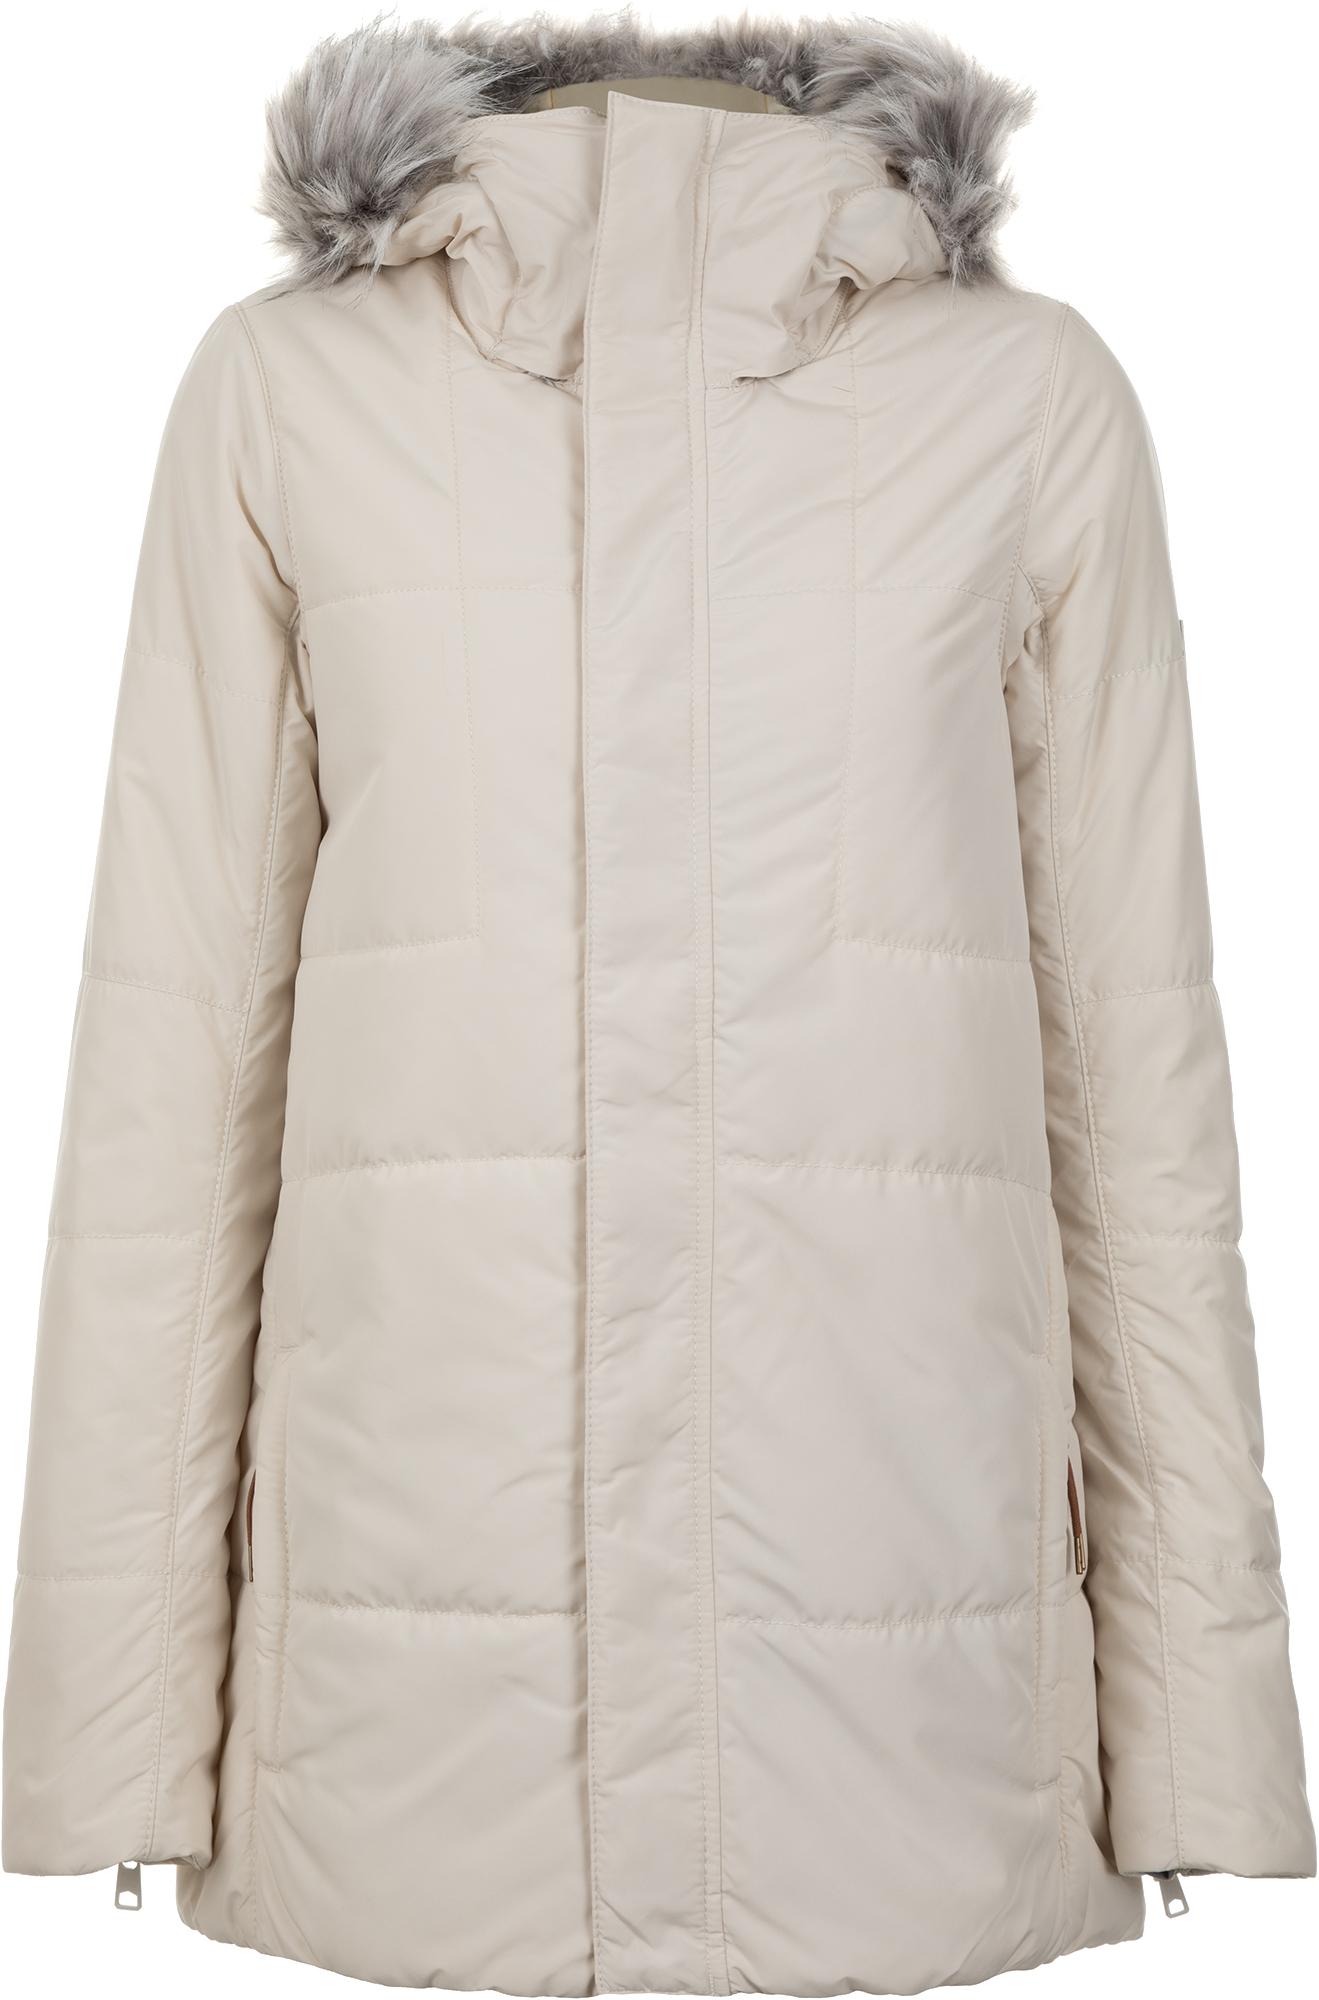 O'Neill Куртка утепленная женская O'Neill Pw Glow, размер 46-48 o neill куртка утепленная женская o neill pw hybrid cluster iii размер 48 50